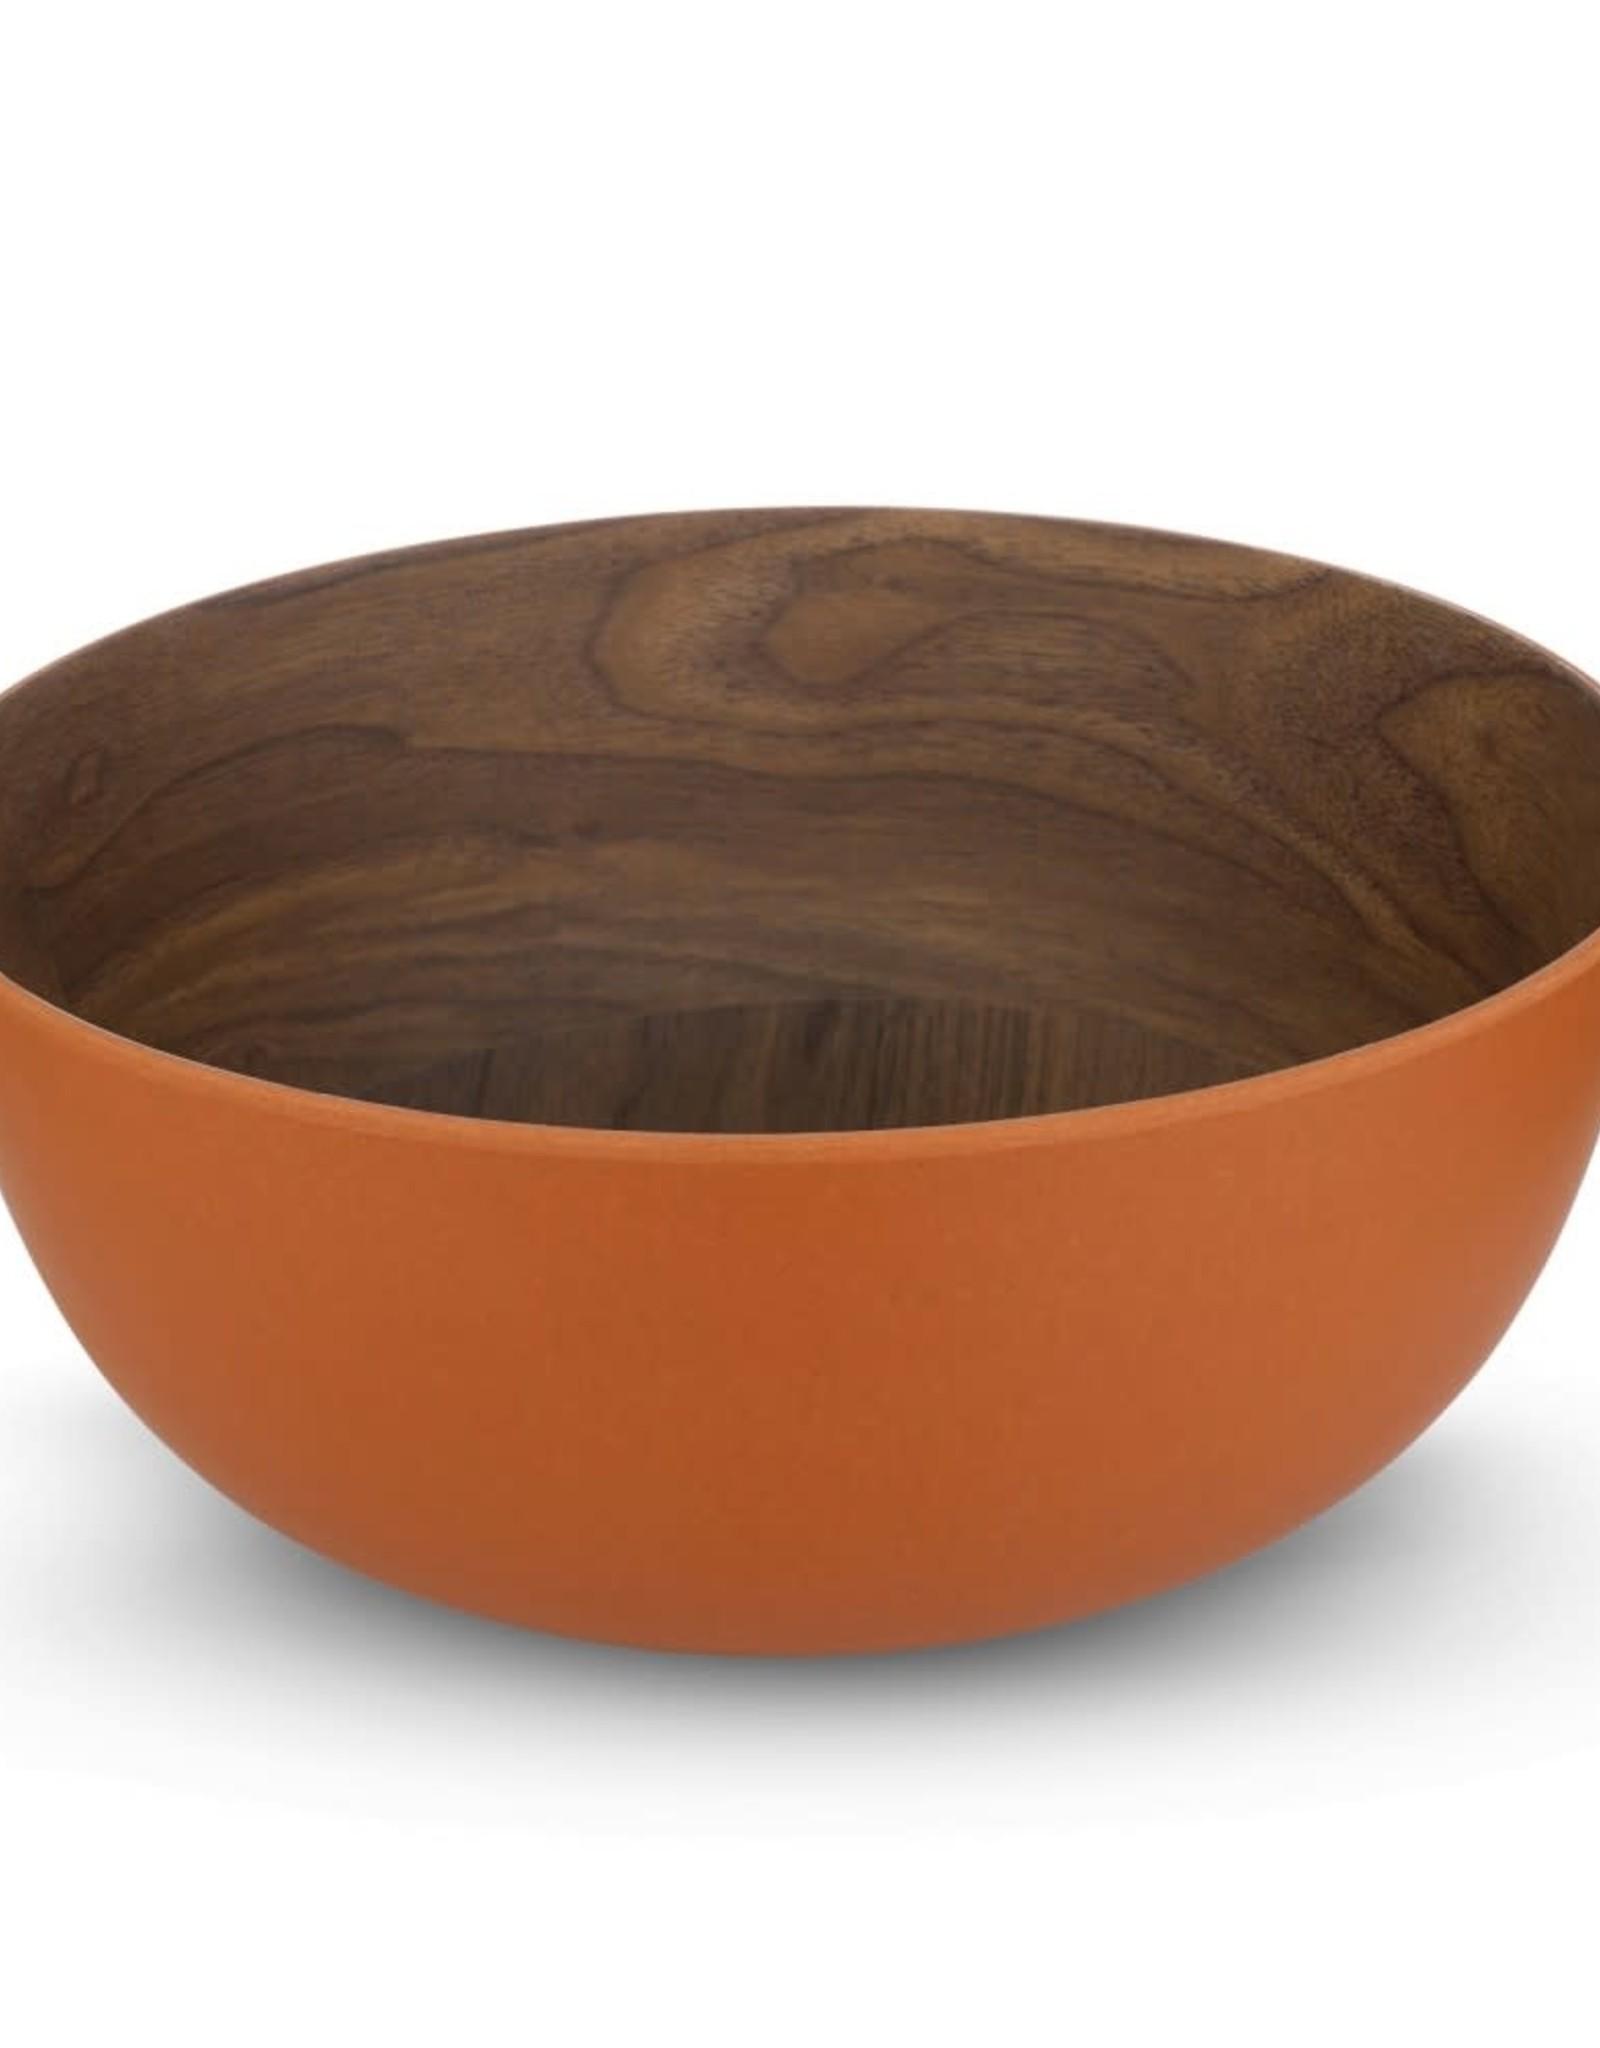 9 Inch (23 Cm) Bamboo Bowl